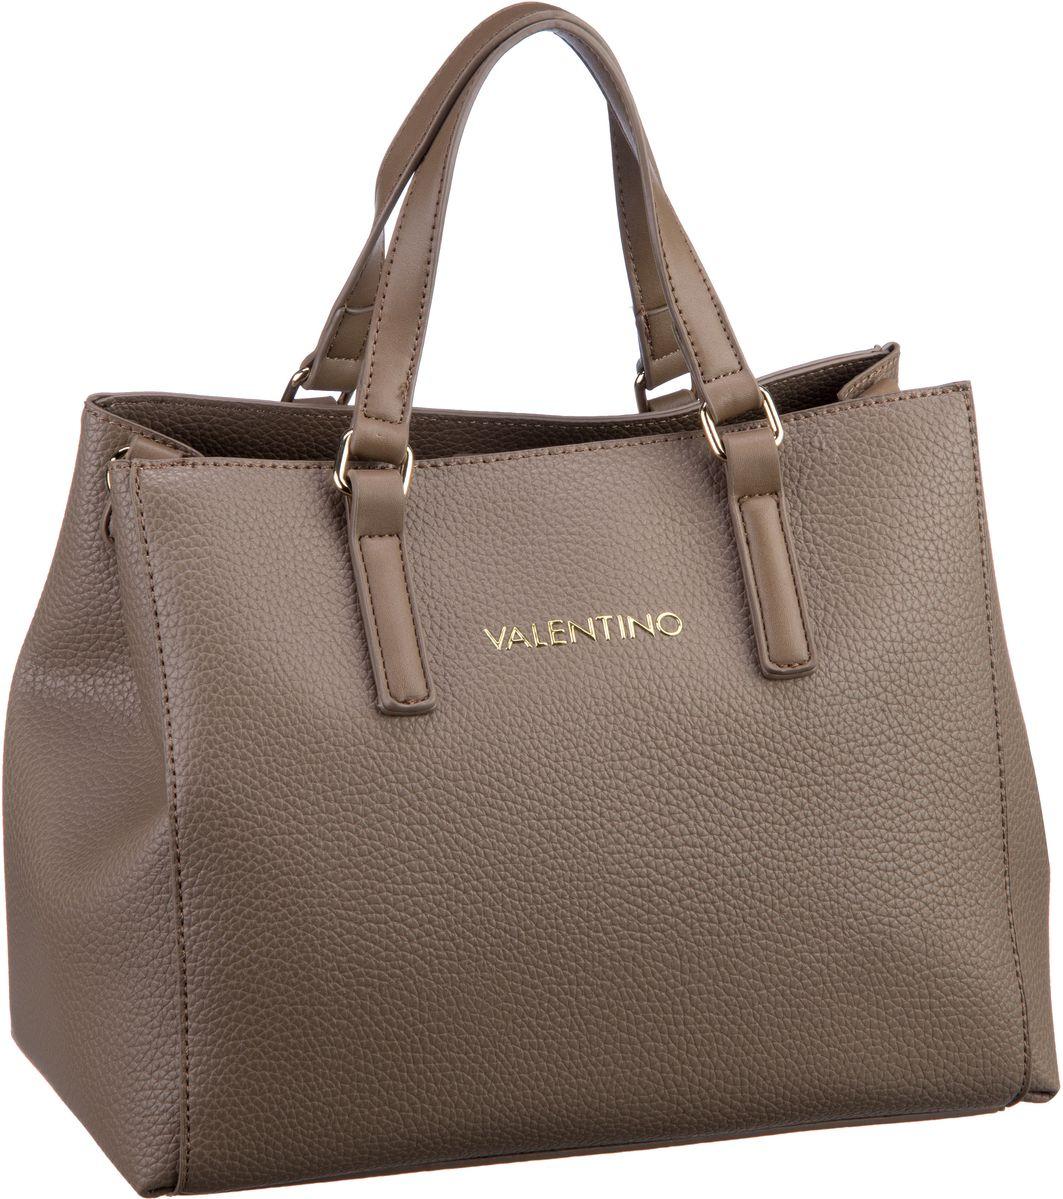 Valentino Handtasche Superman Shopping U803 Taupe